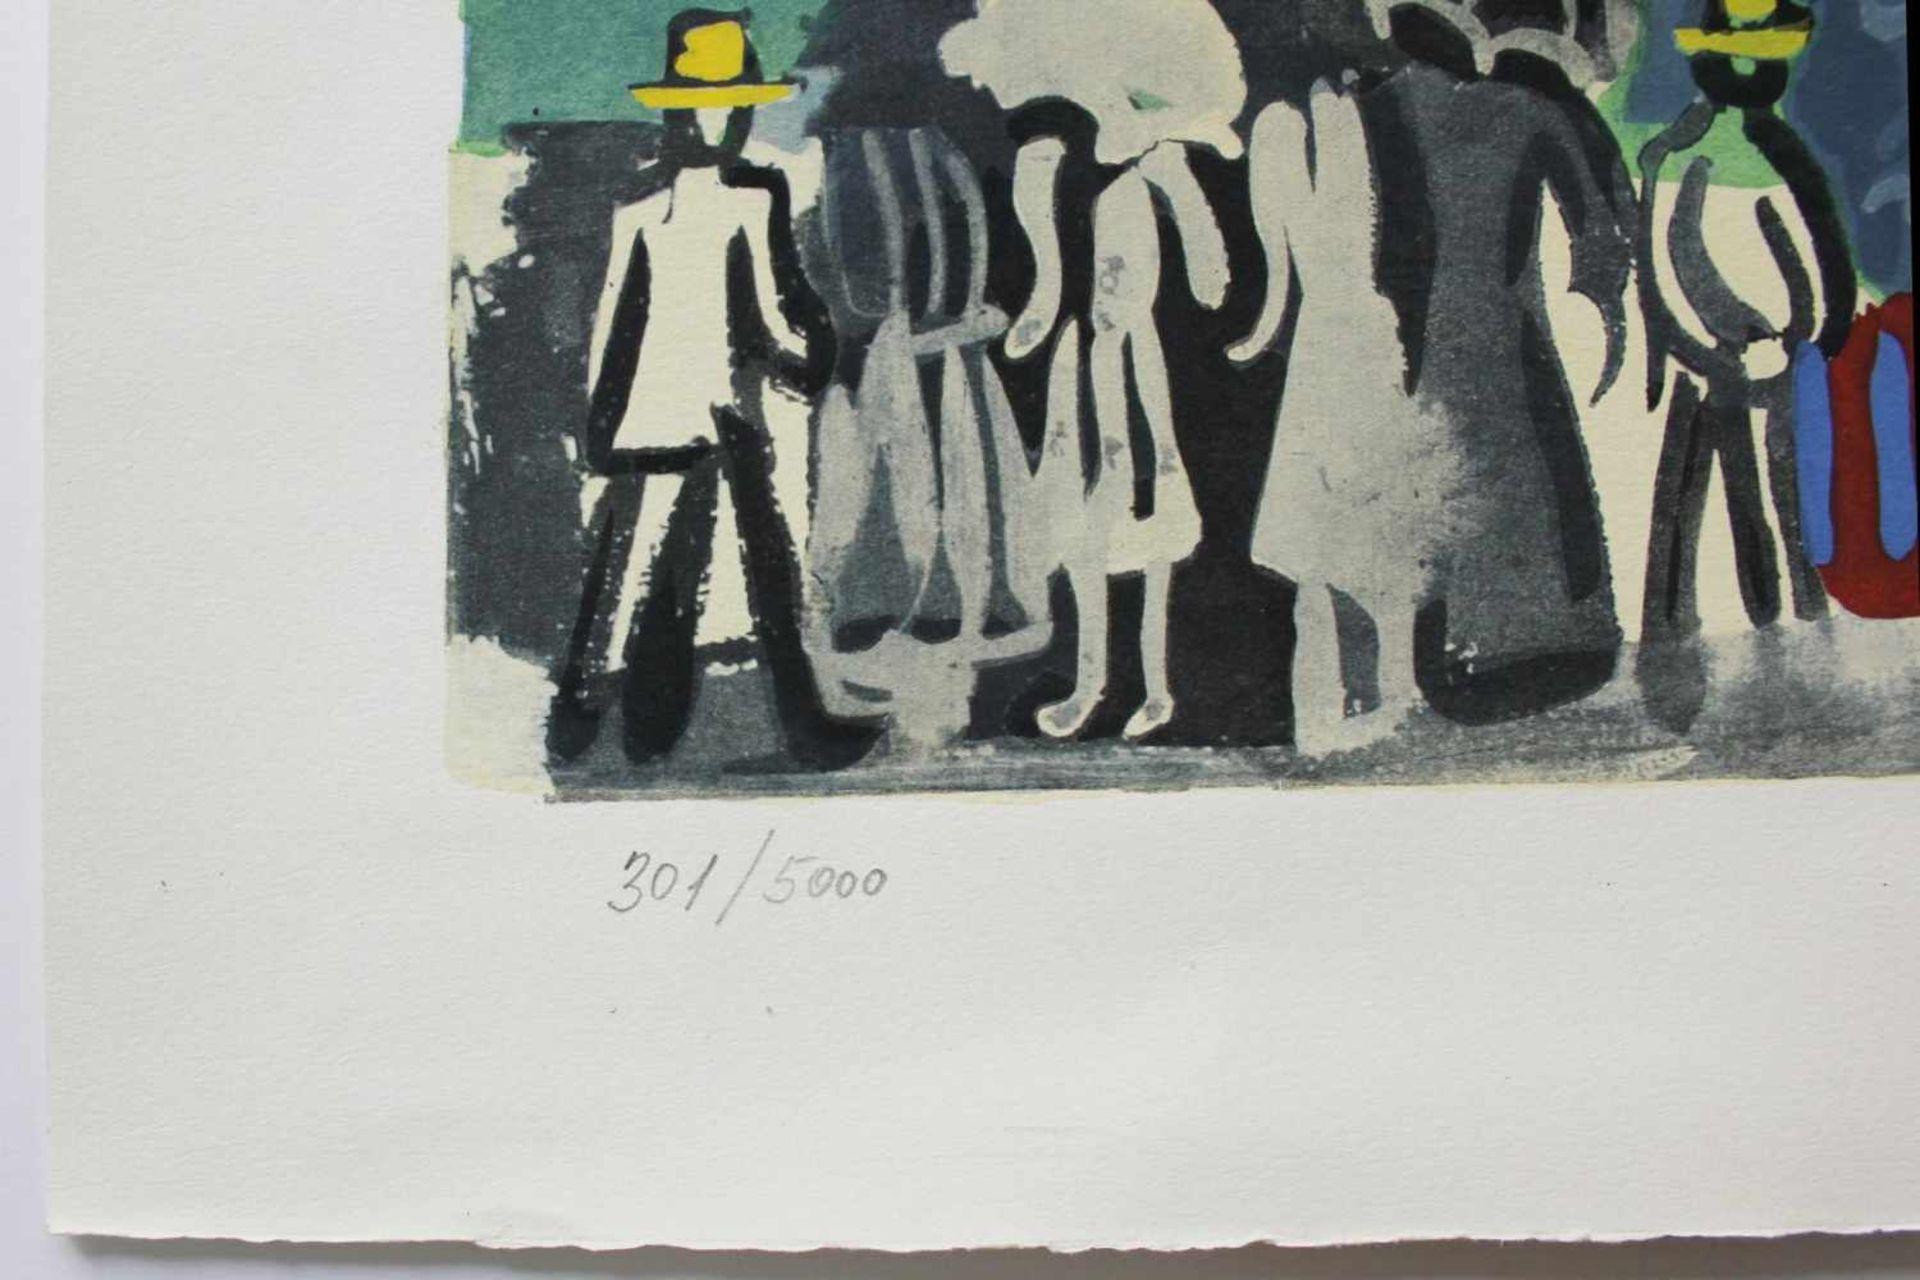 Raoul Dufy 1877 - 1953 Strandpromenade Lithographie stempelsigniert, nummeriert 301/5000 56 x 66 cm - Bild 3 aus 3